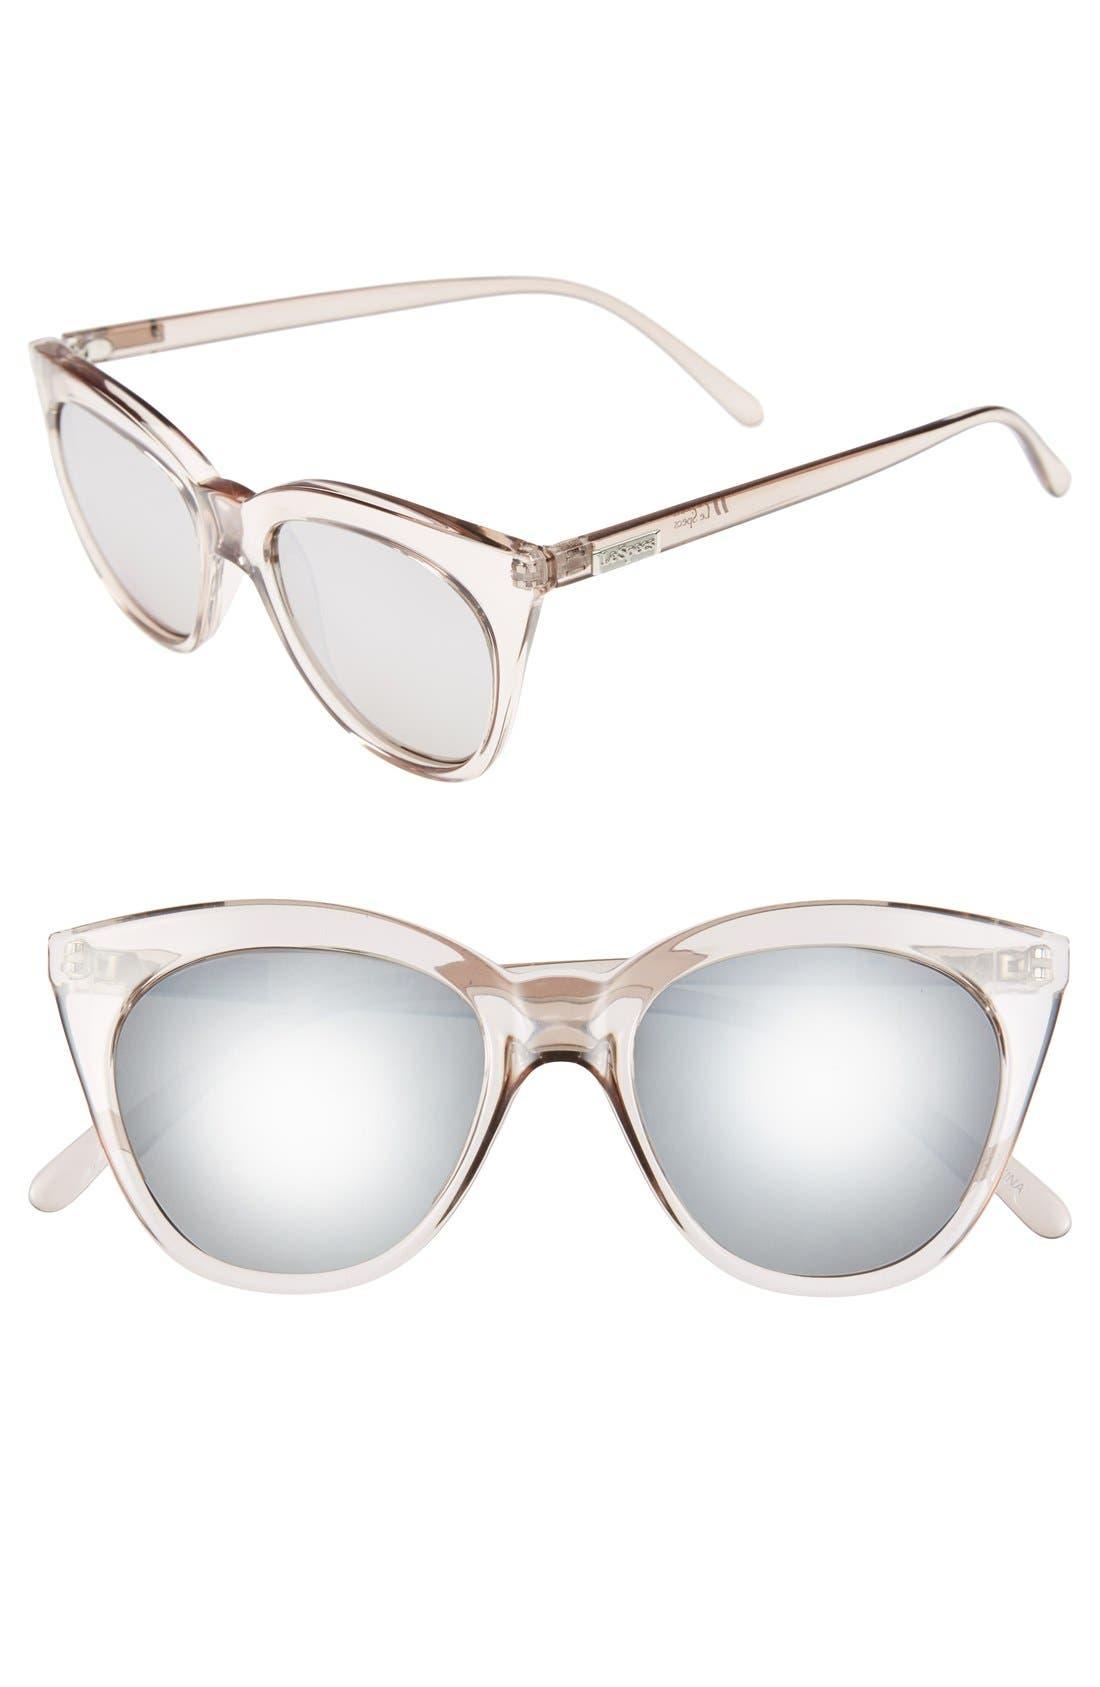 Main Image - Le Specs Halfmoon Magic 51mm Cat Eye Sunglasses